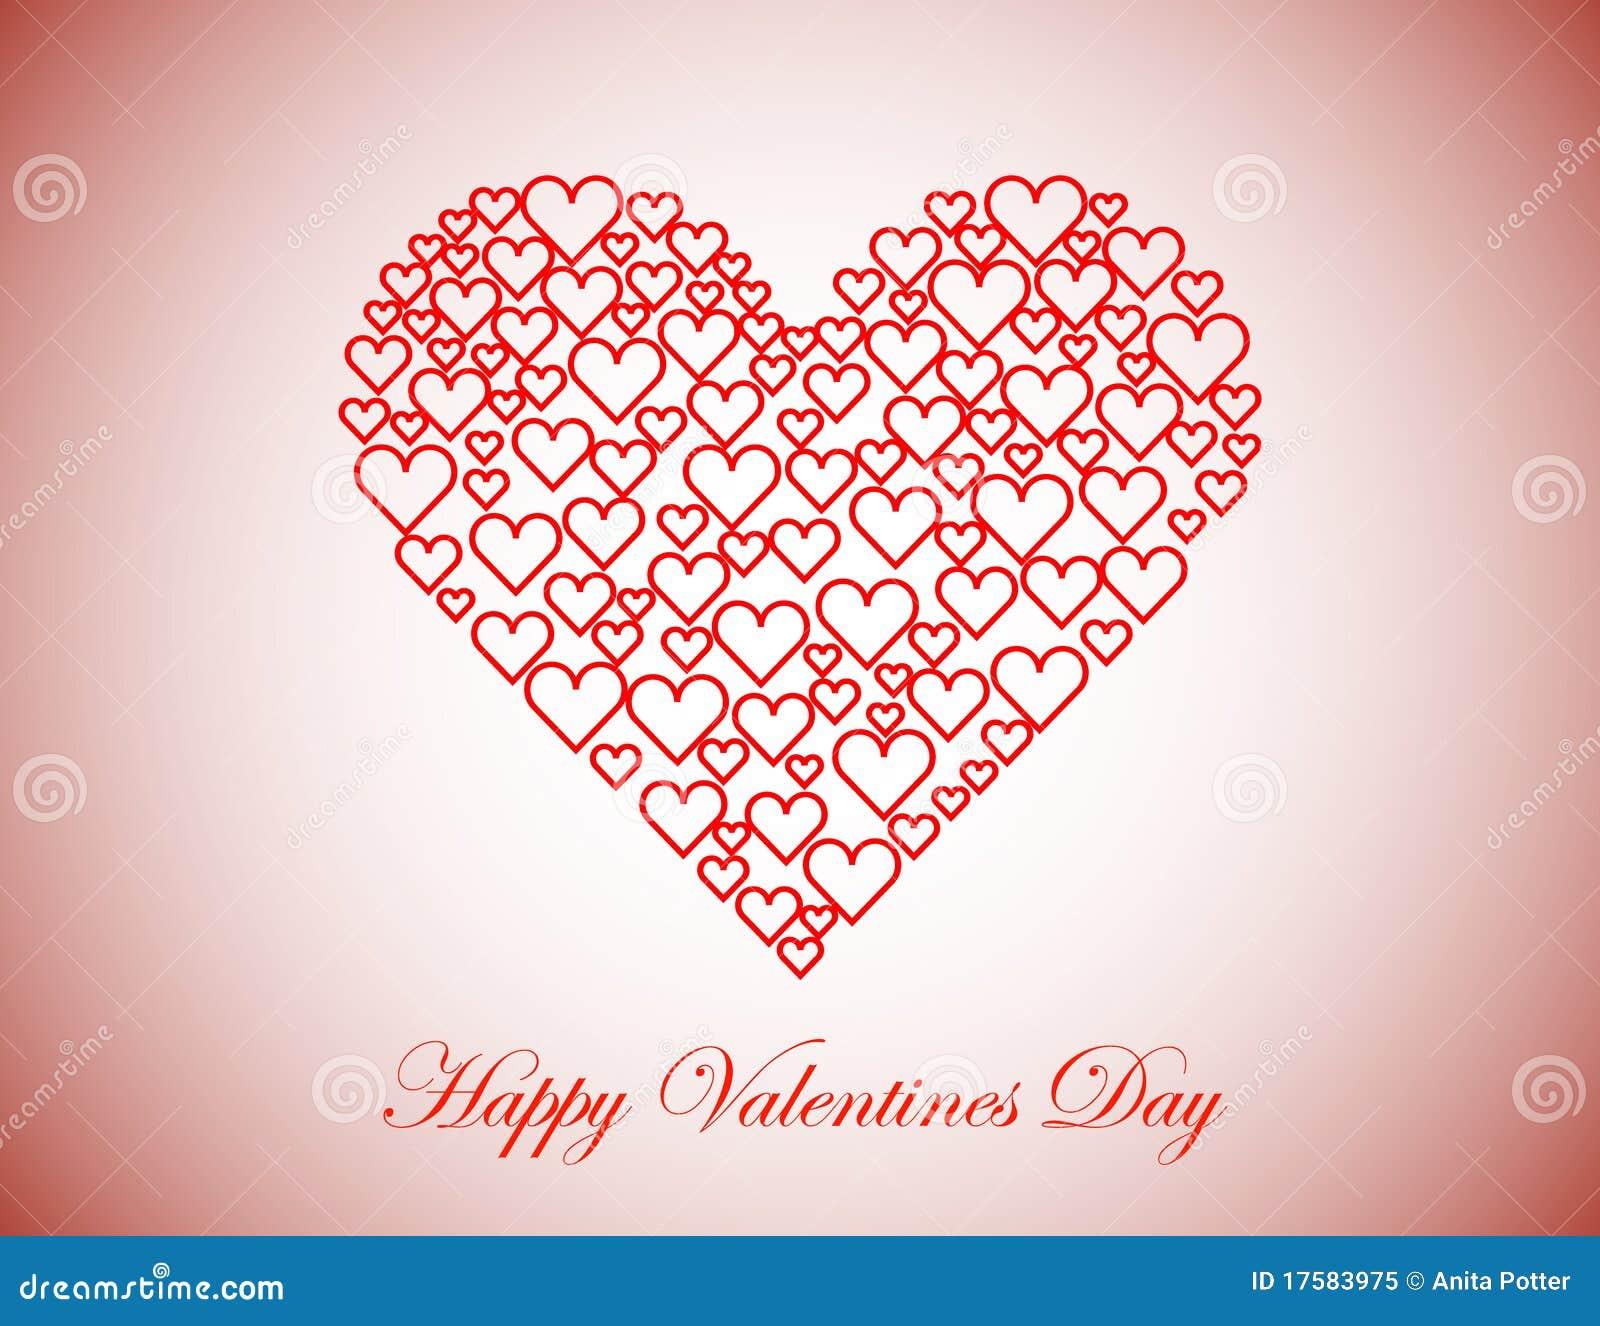 happy valentines day background stock vector image 17583975. Black Bedroom Furniture Sets. Home Design Ideas